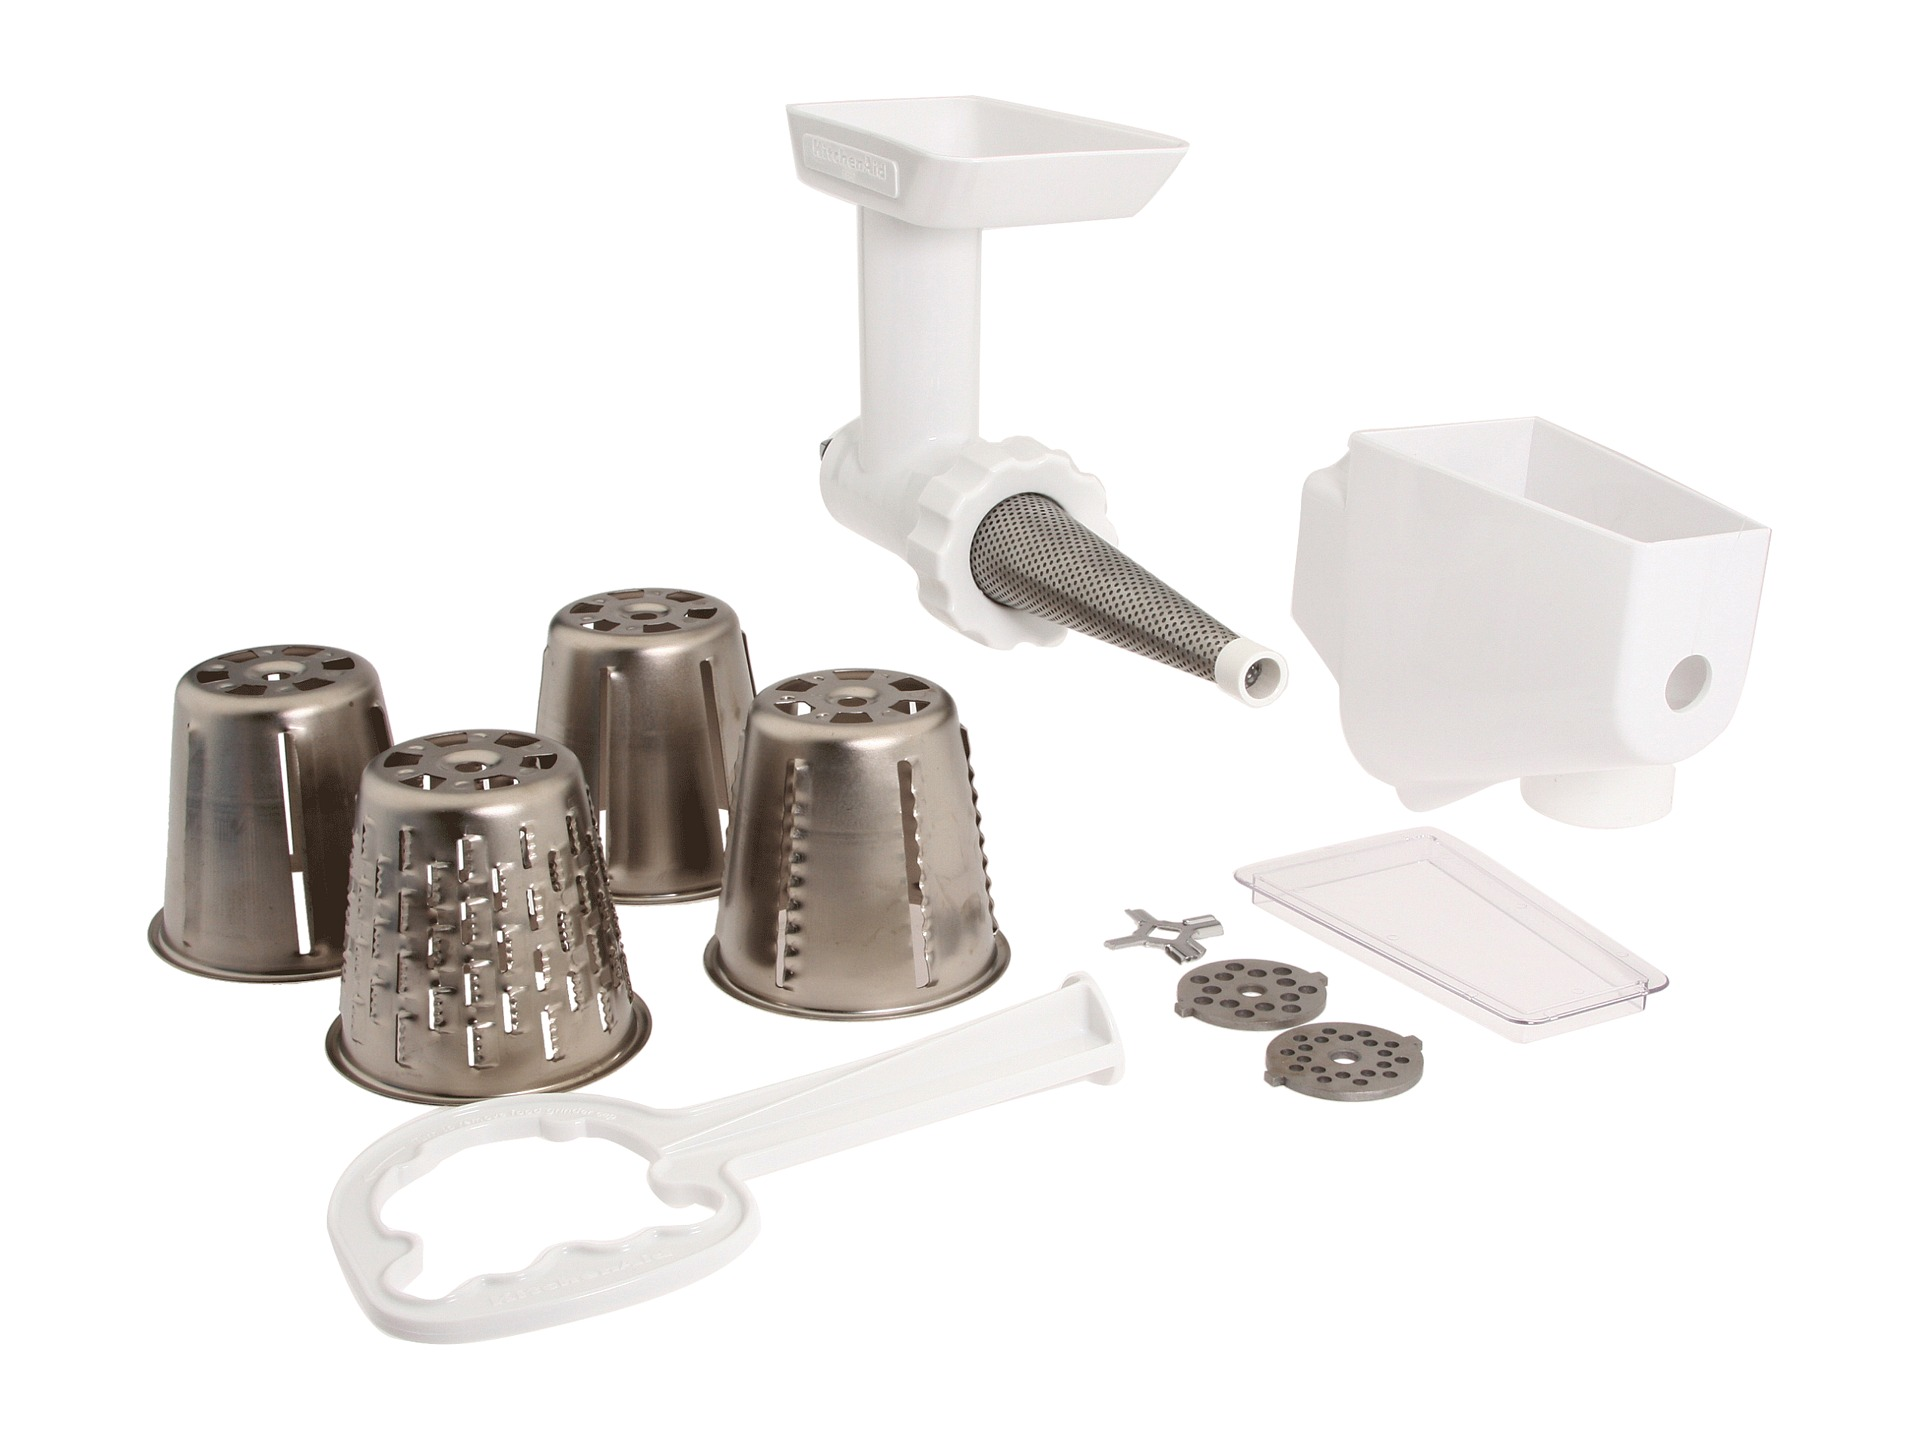 Kitchenaid Mixer Attachment Pack White Shipped Free At Zappos